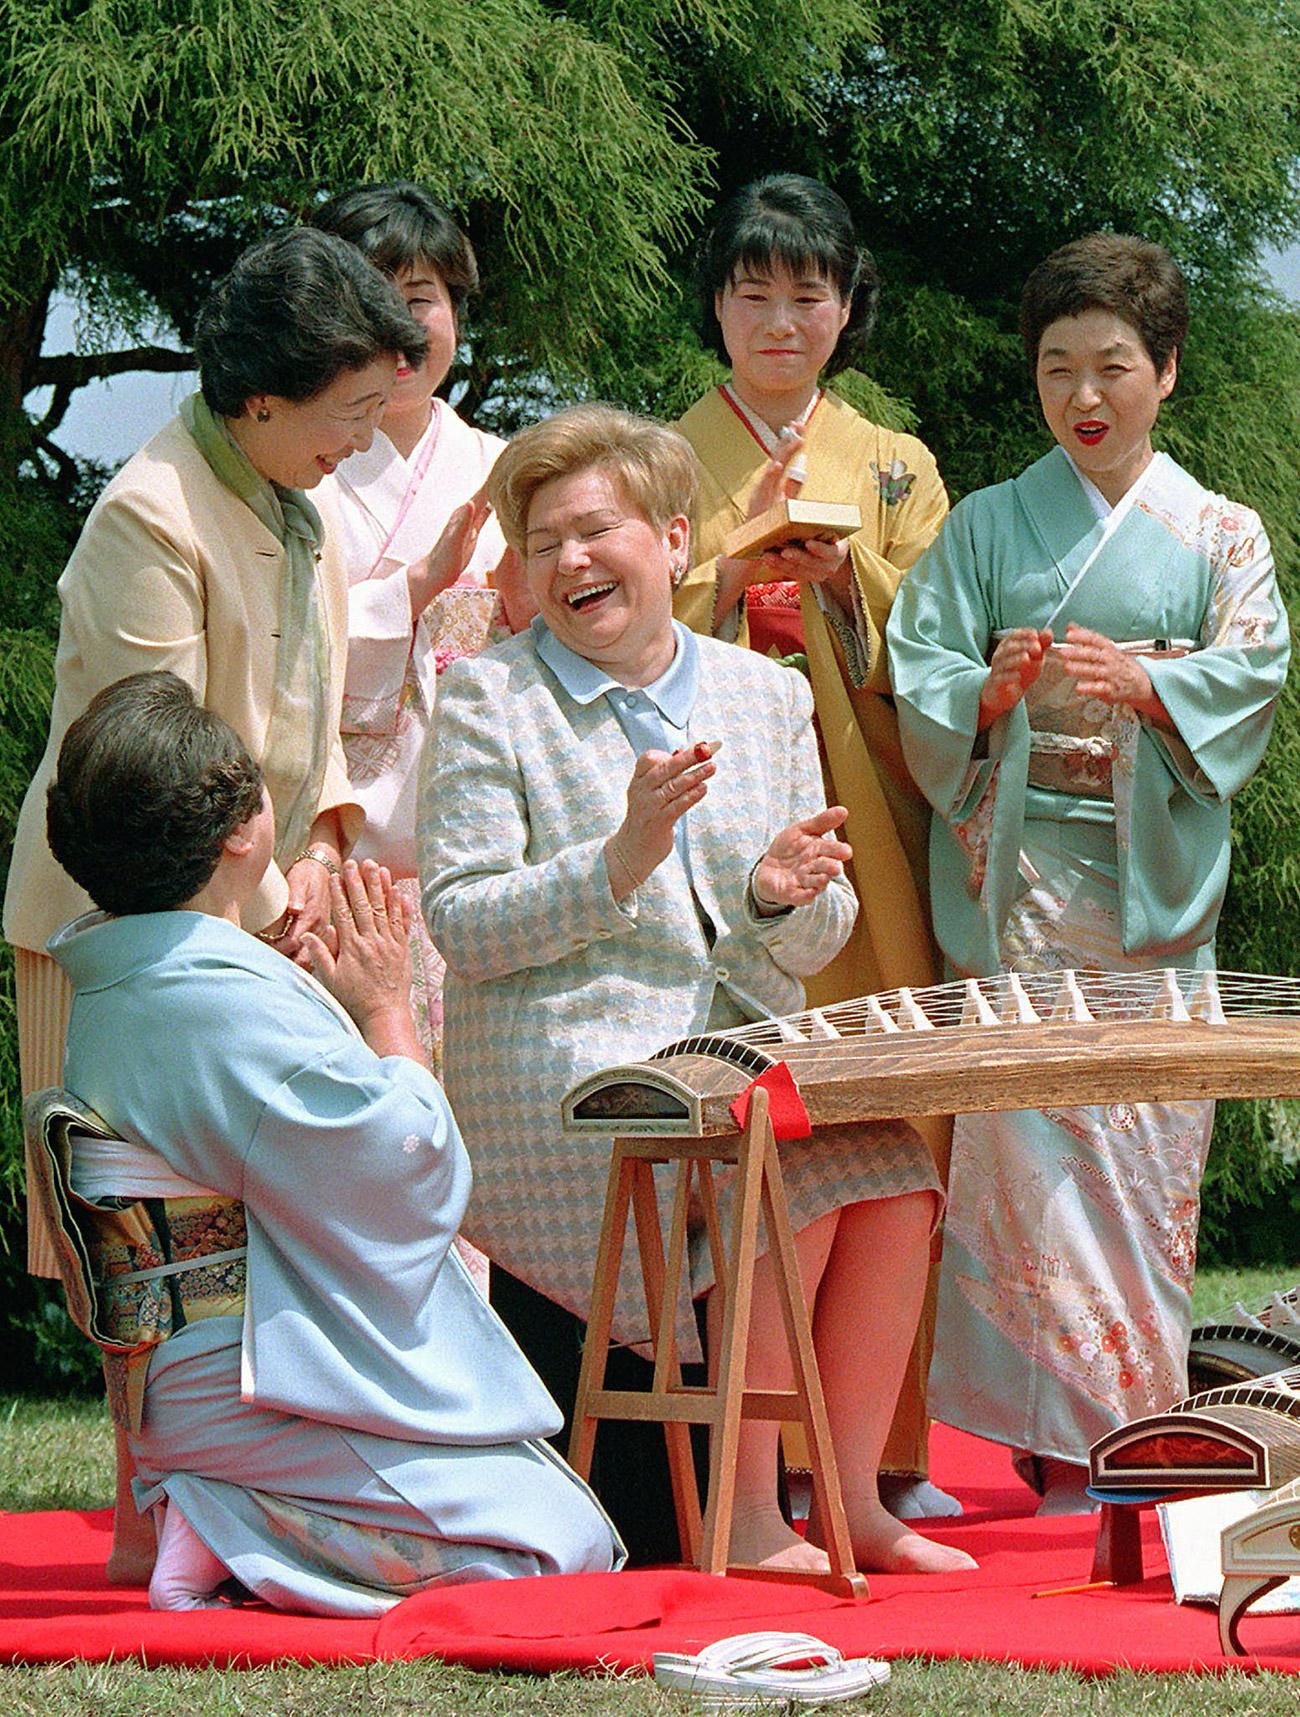 Naina Yeltsina (C), enjoys an outdoor tea ceremony with Japanese Prime Minister Ryutaro Hashimoto's wife Kumiko (L) in 1998. Source: Reuters